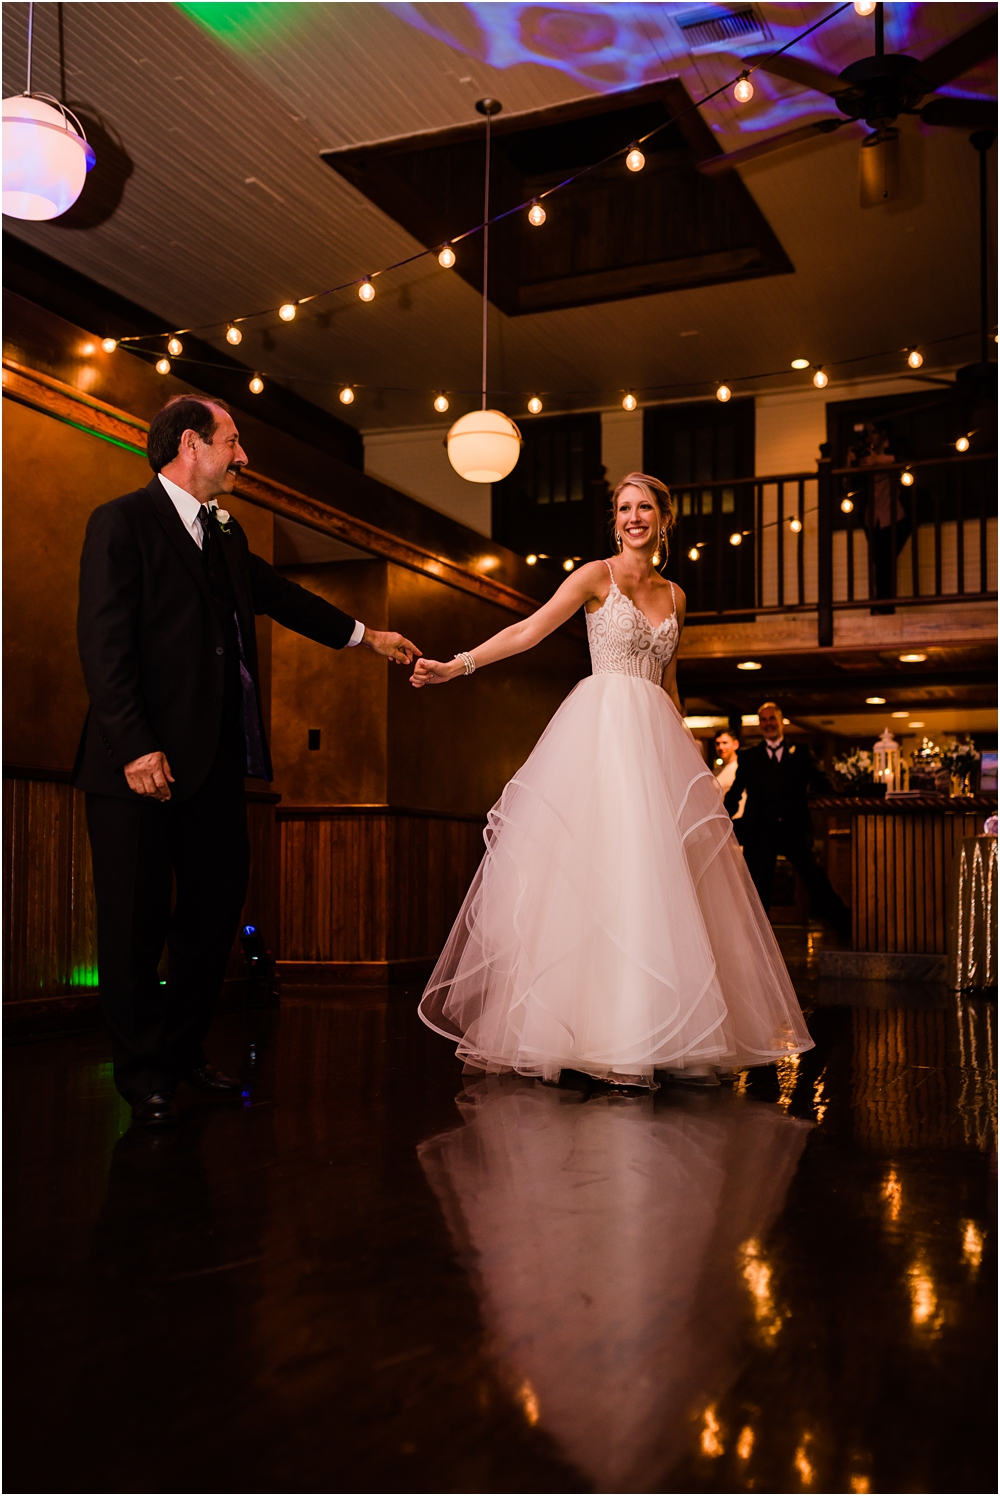 oconnor-pensacola-florida-wedding-photographer-kiersten-taylor-123.jpg